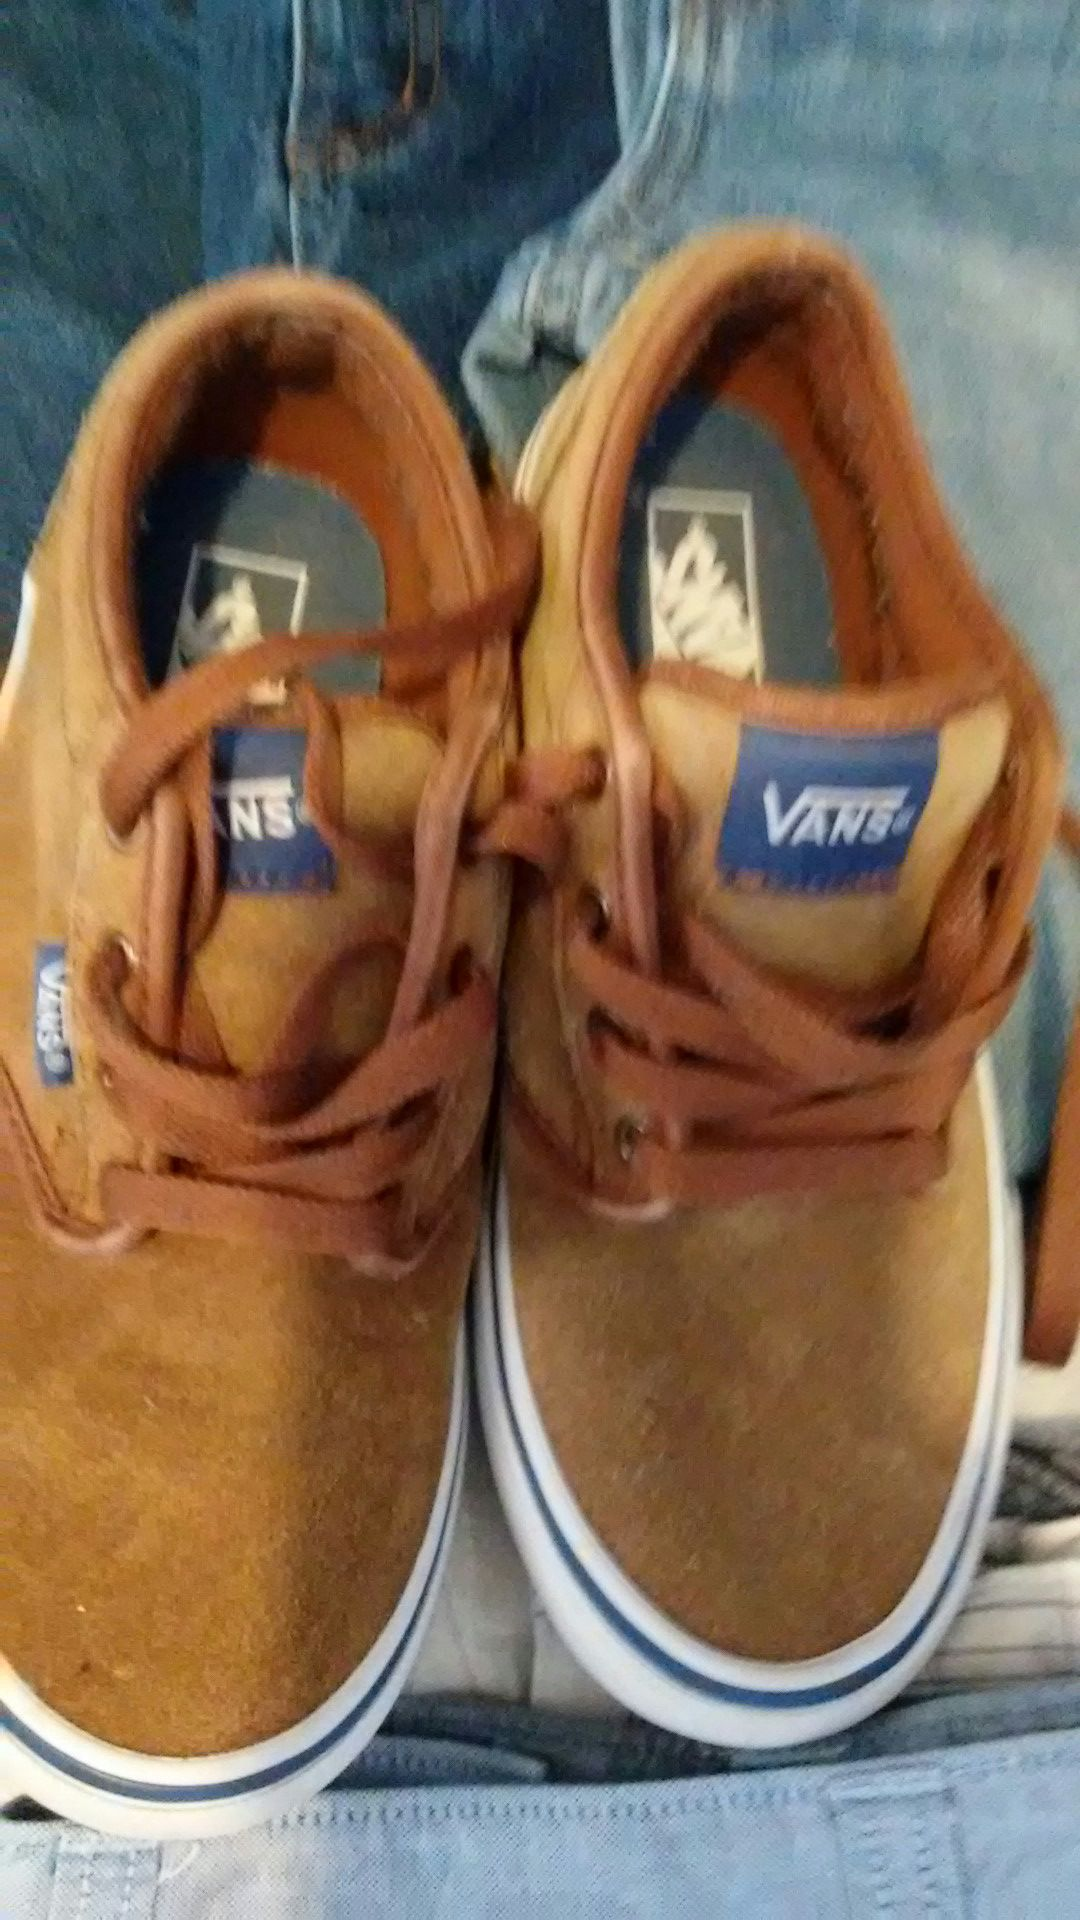 nautica,quicksliver,vans clothes and shoes